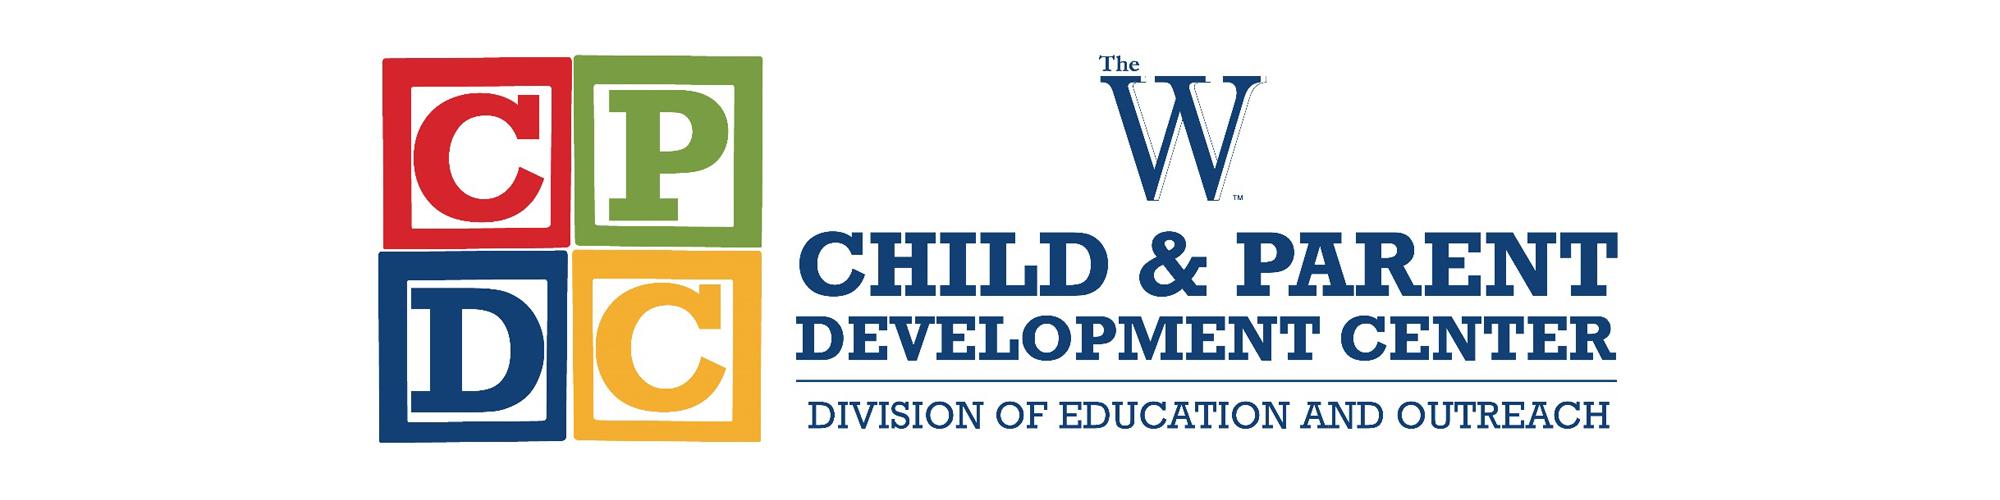 Child & Parent Development Center: Division of Education & Outreach